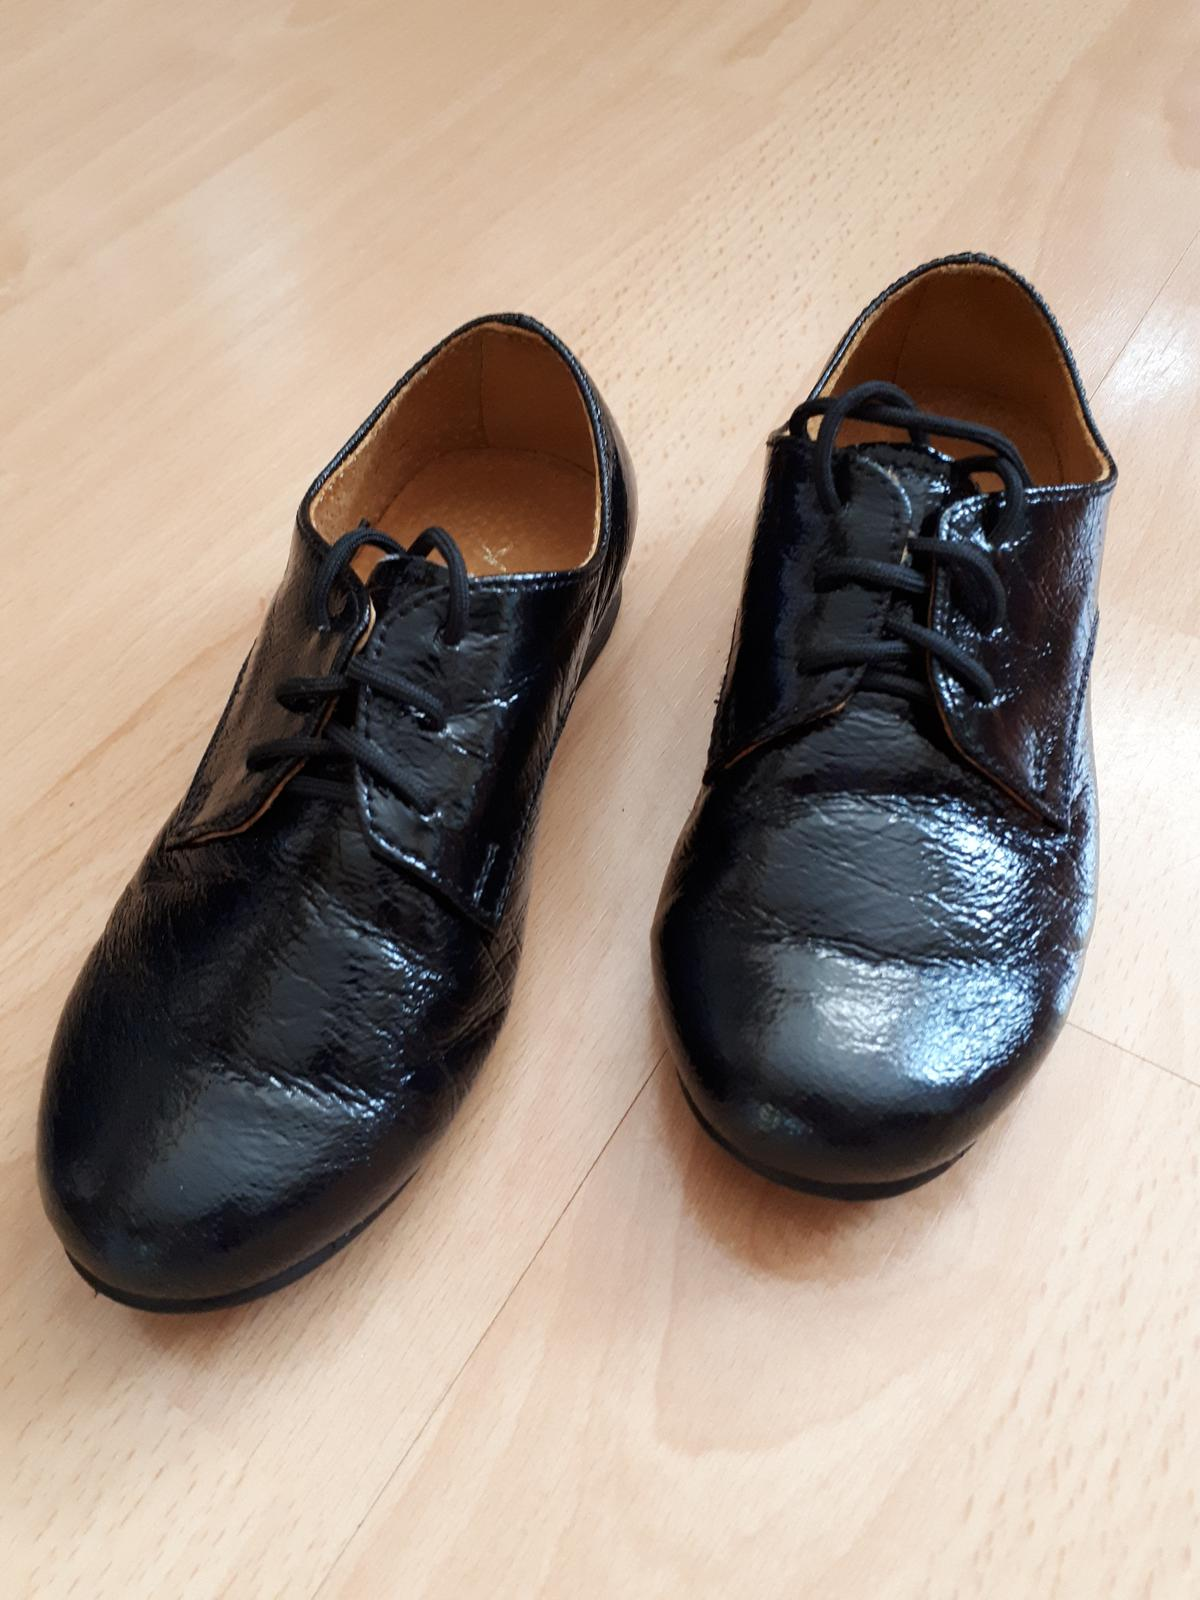 454e460b07a5 Spoločenské topánky